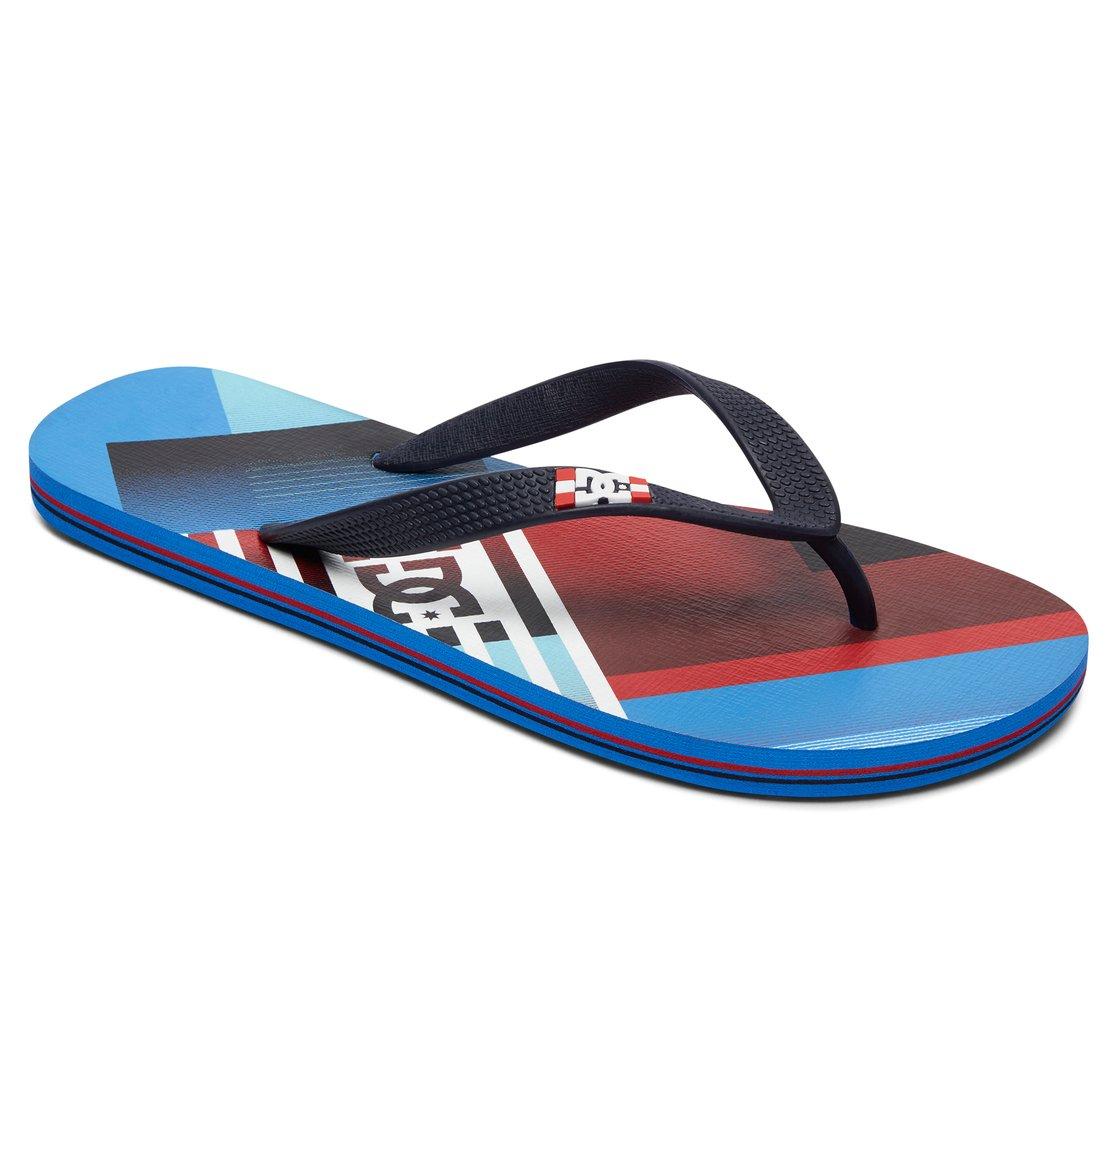 DC Shoes bCJhk7Gz6m